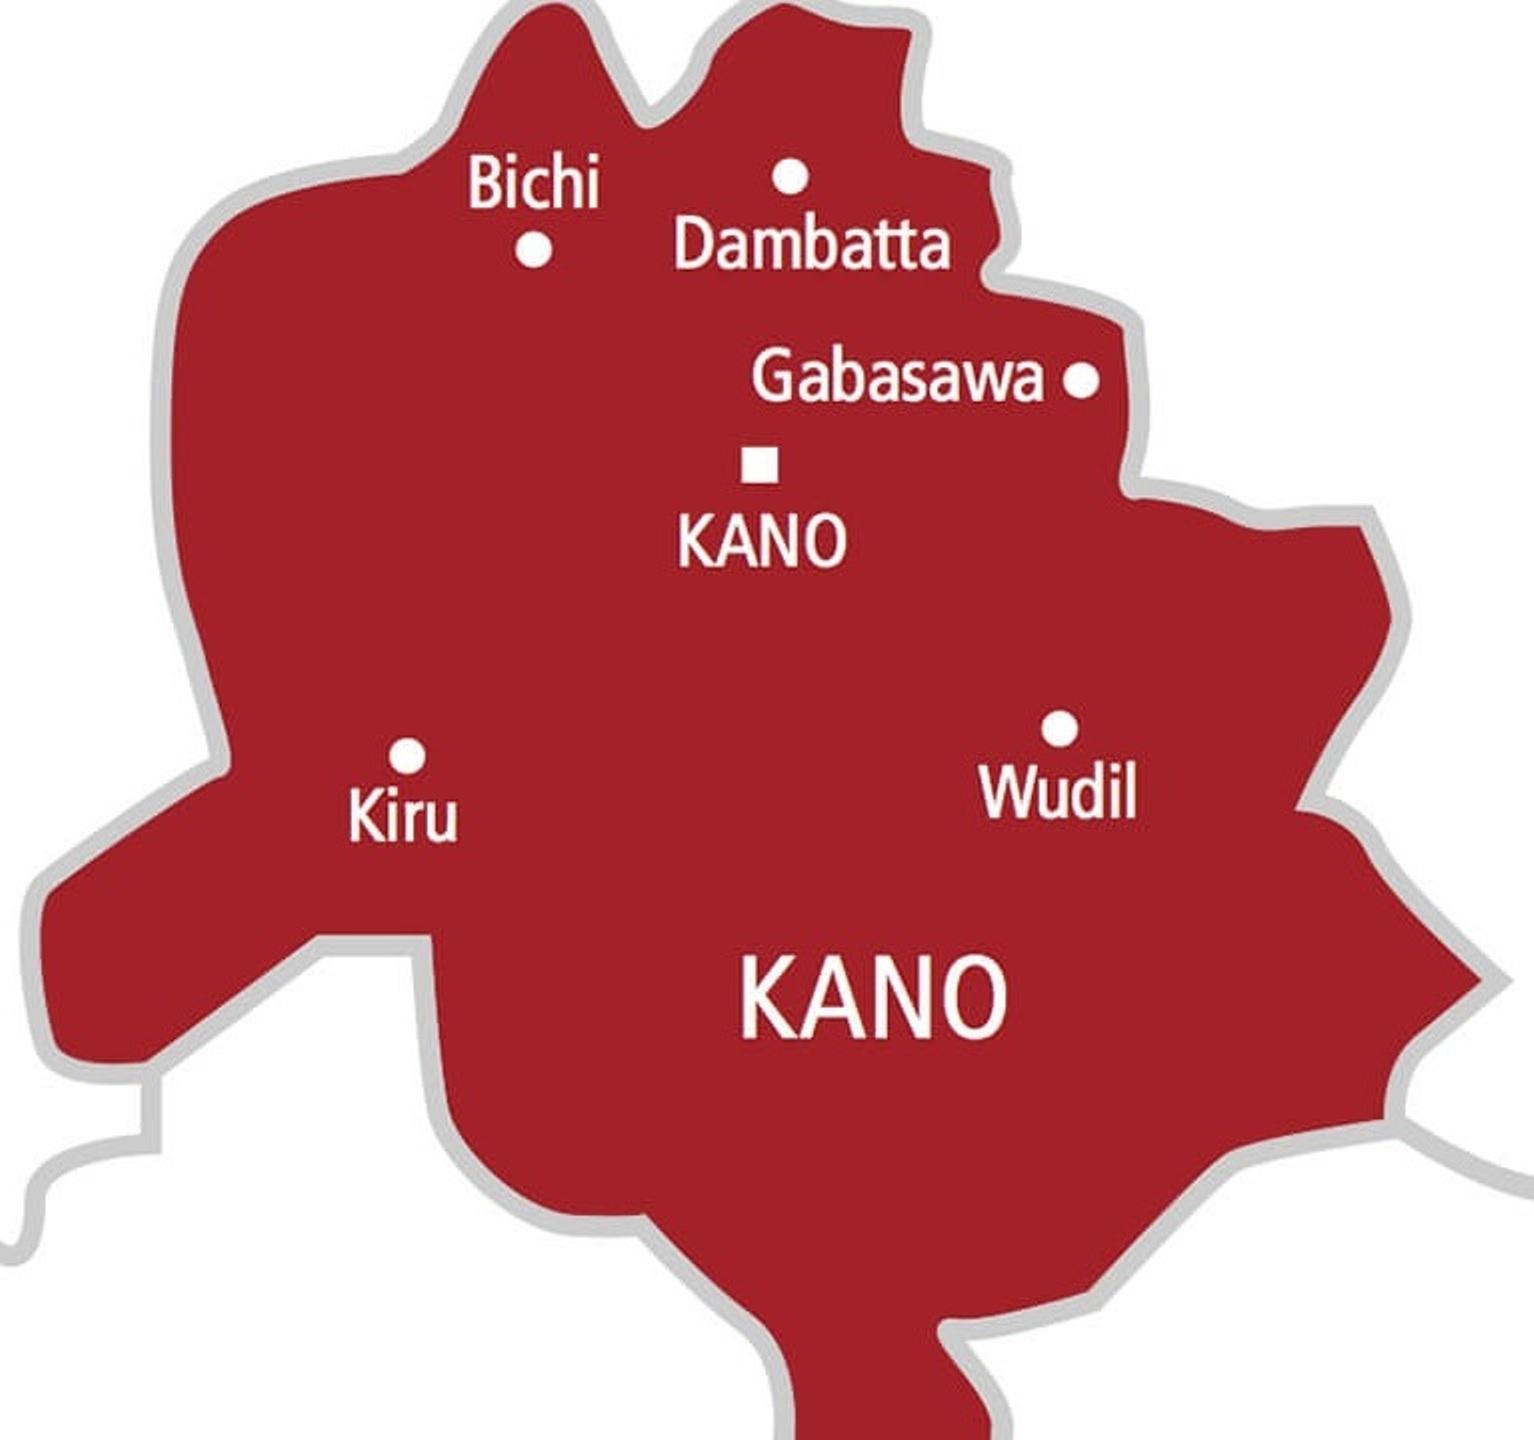 FG trains Kano, Jigawa women, youths in skills acquisition